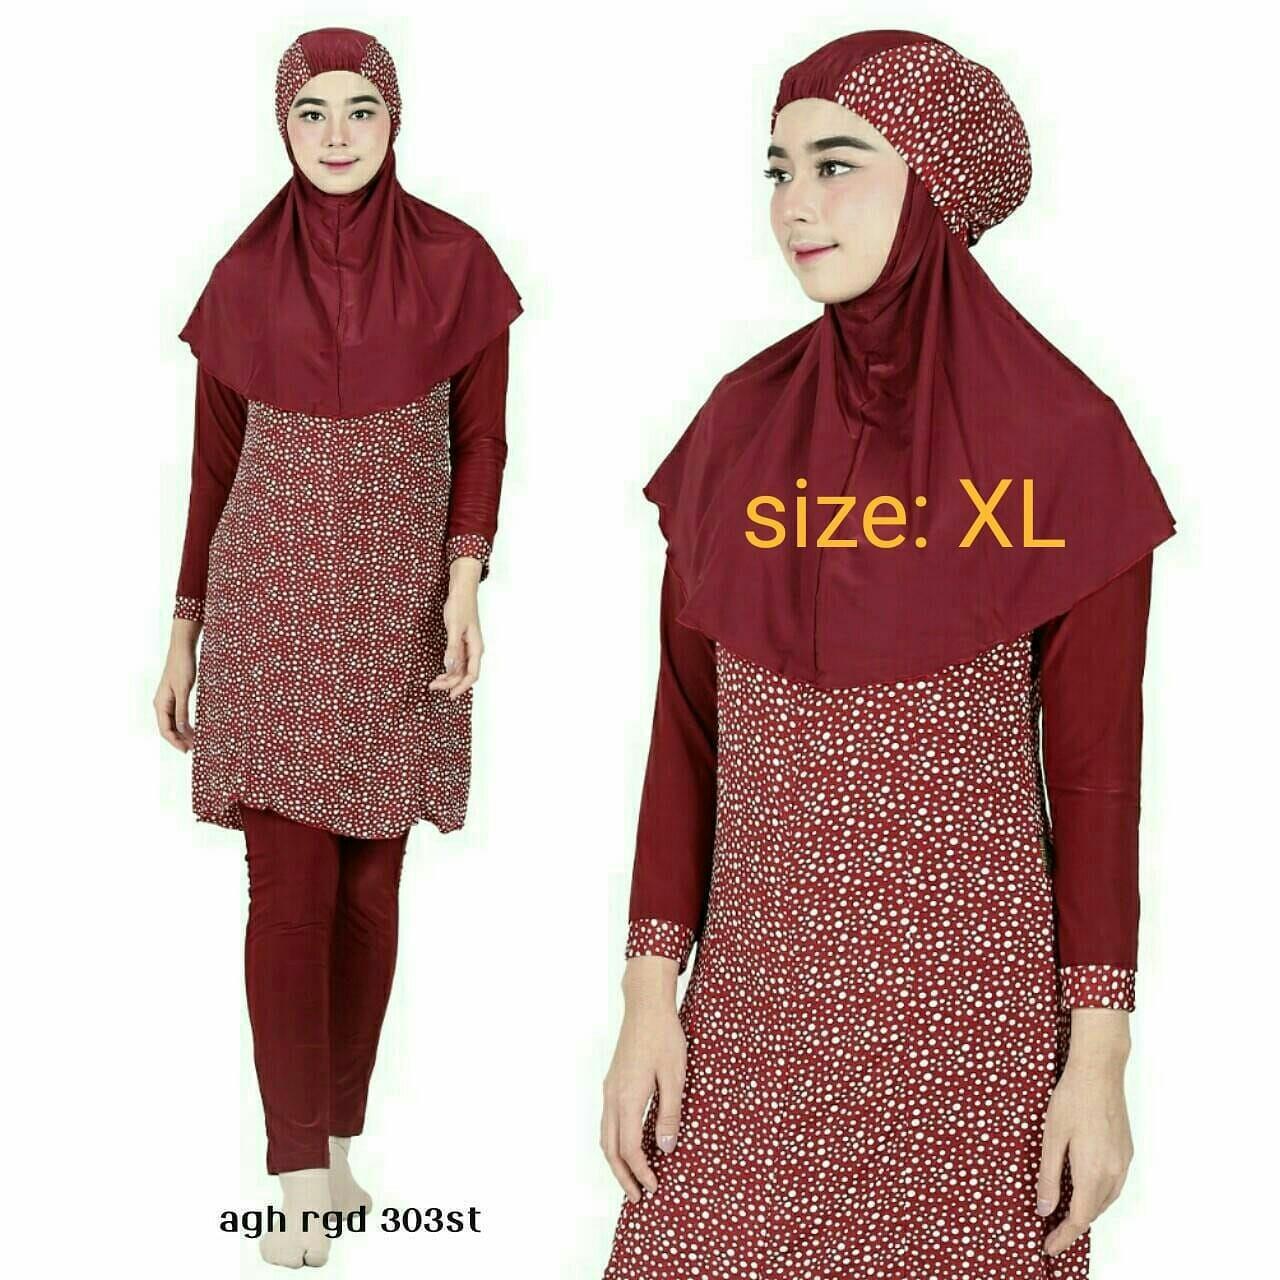 Baju renang muslimah XL